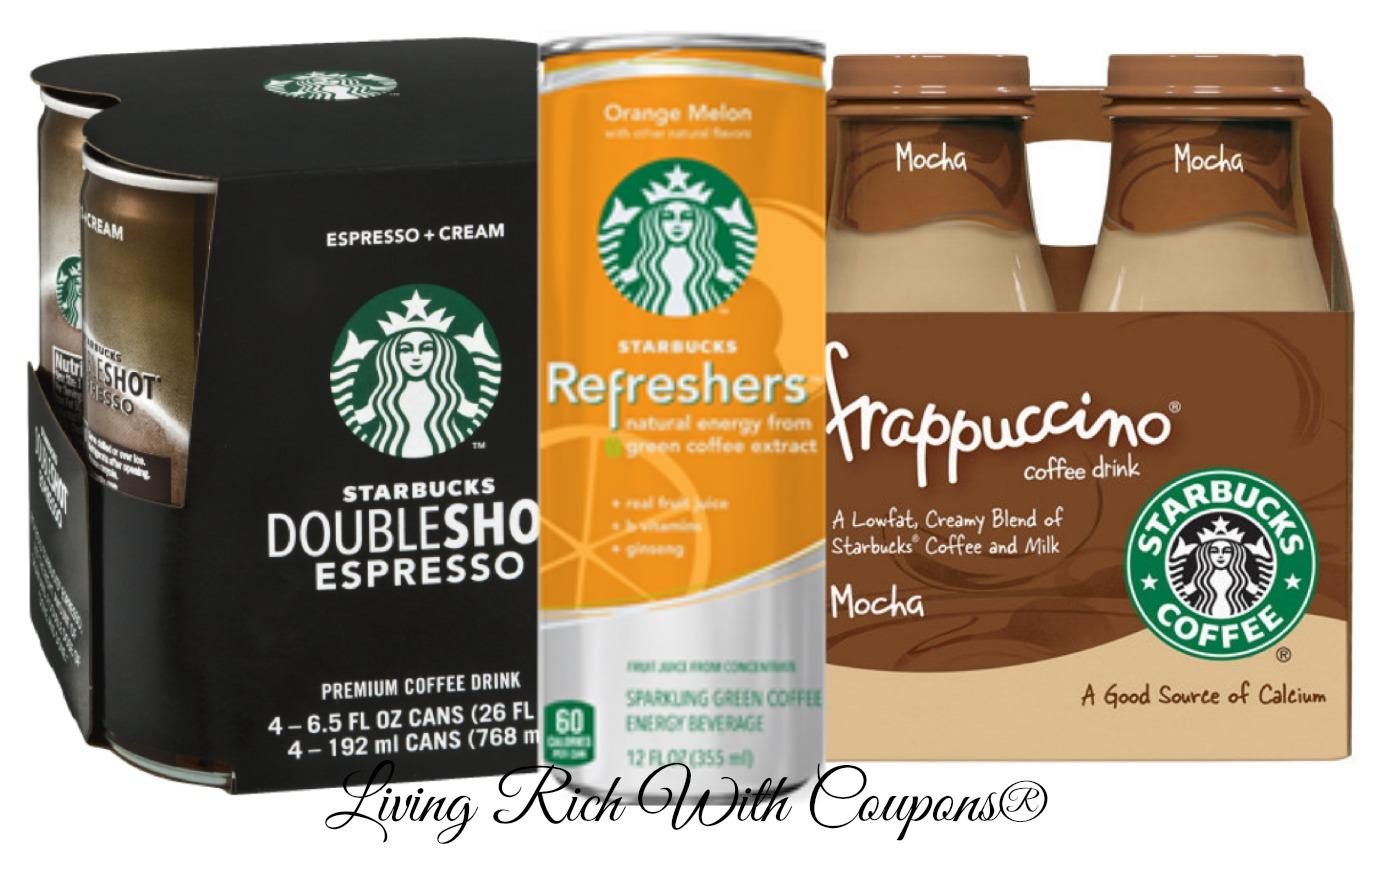 Starbucks discount coupons